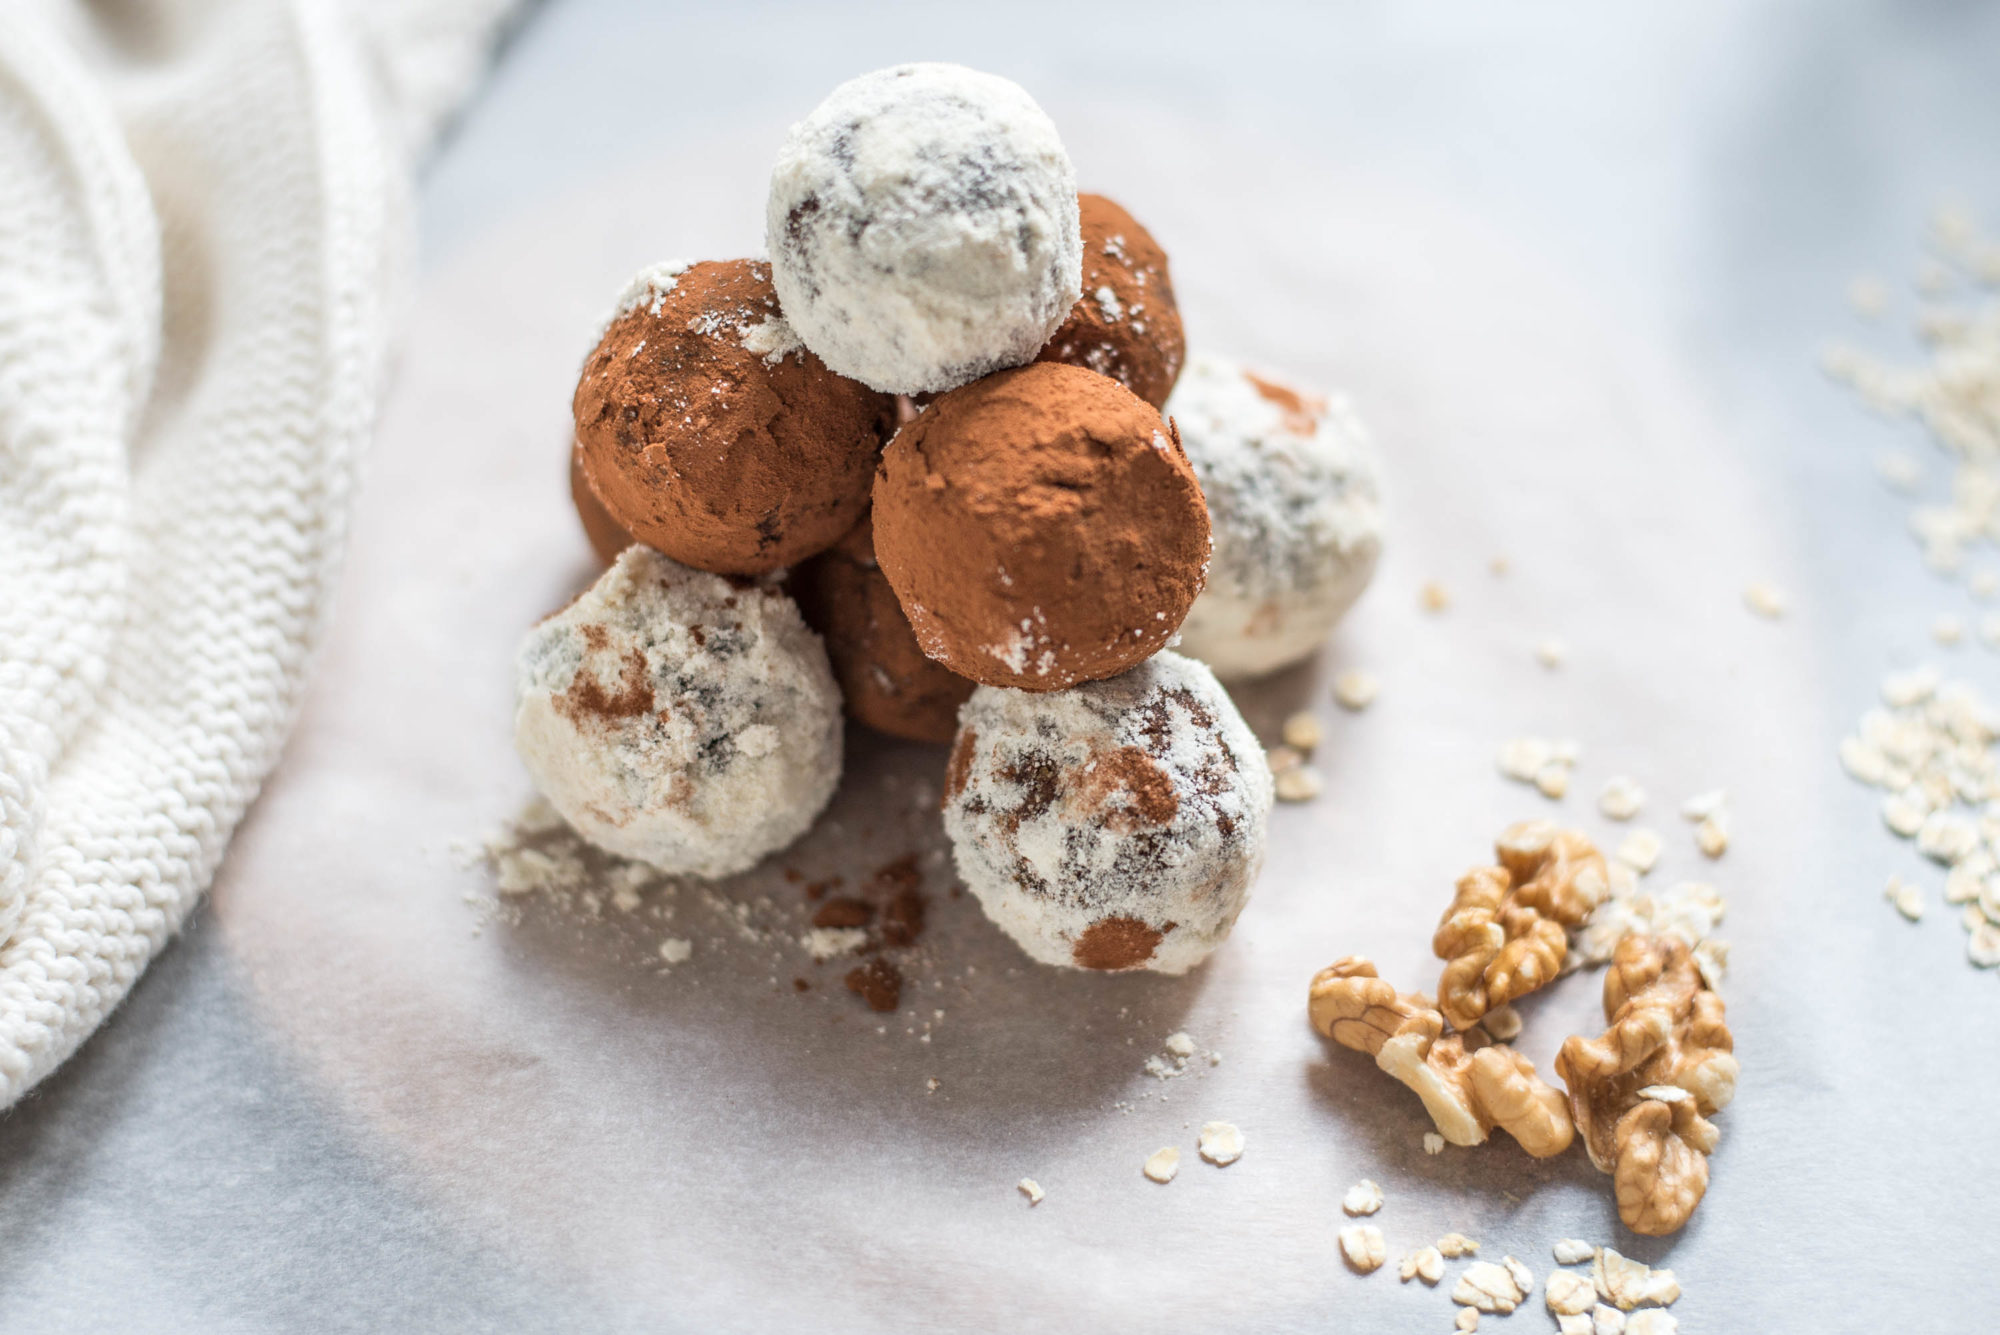 Roh vegane Energiekugeln Karottenkuchen Kakao Kokosmehl Österreich Food Blog Graz